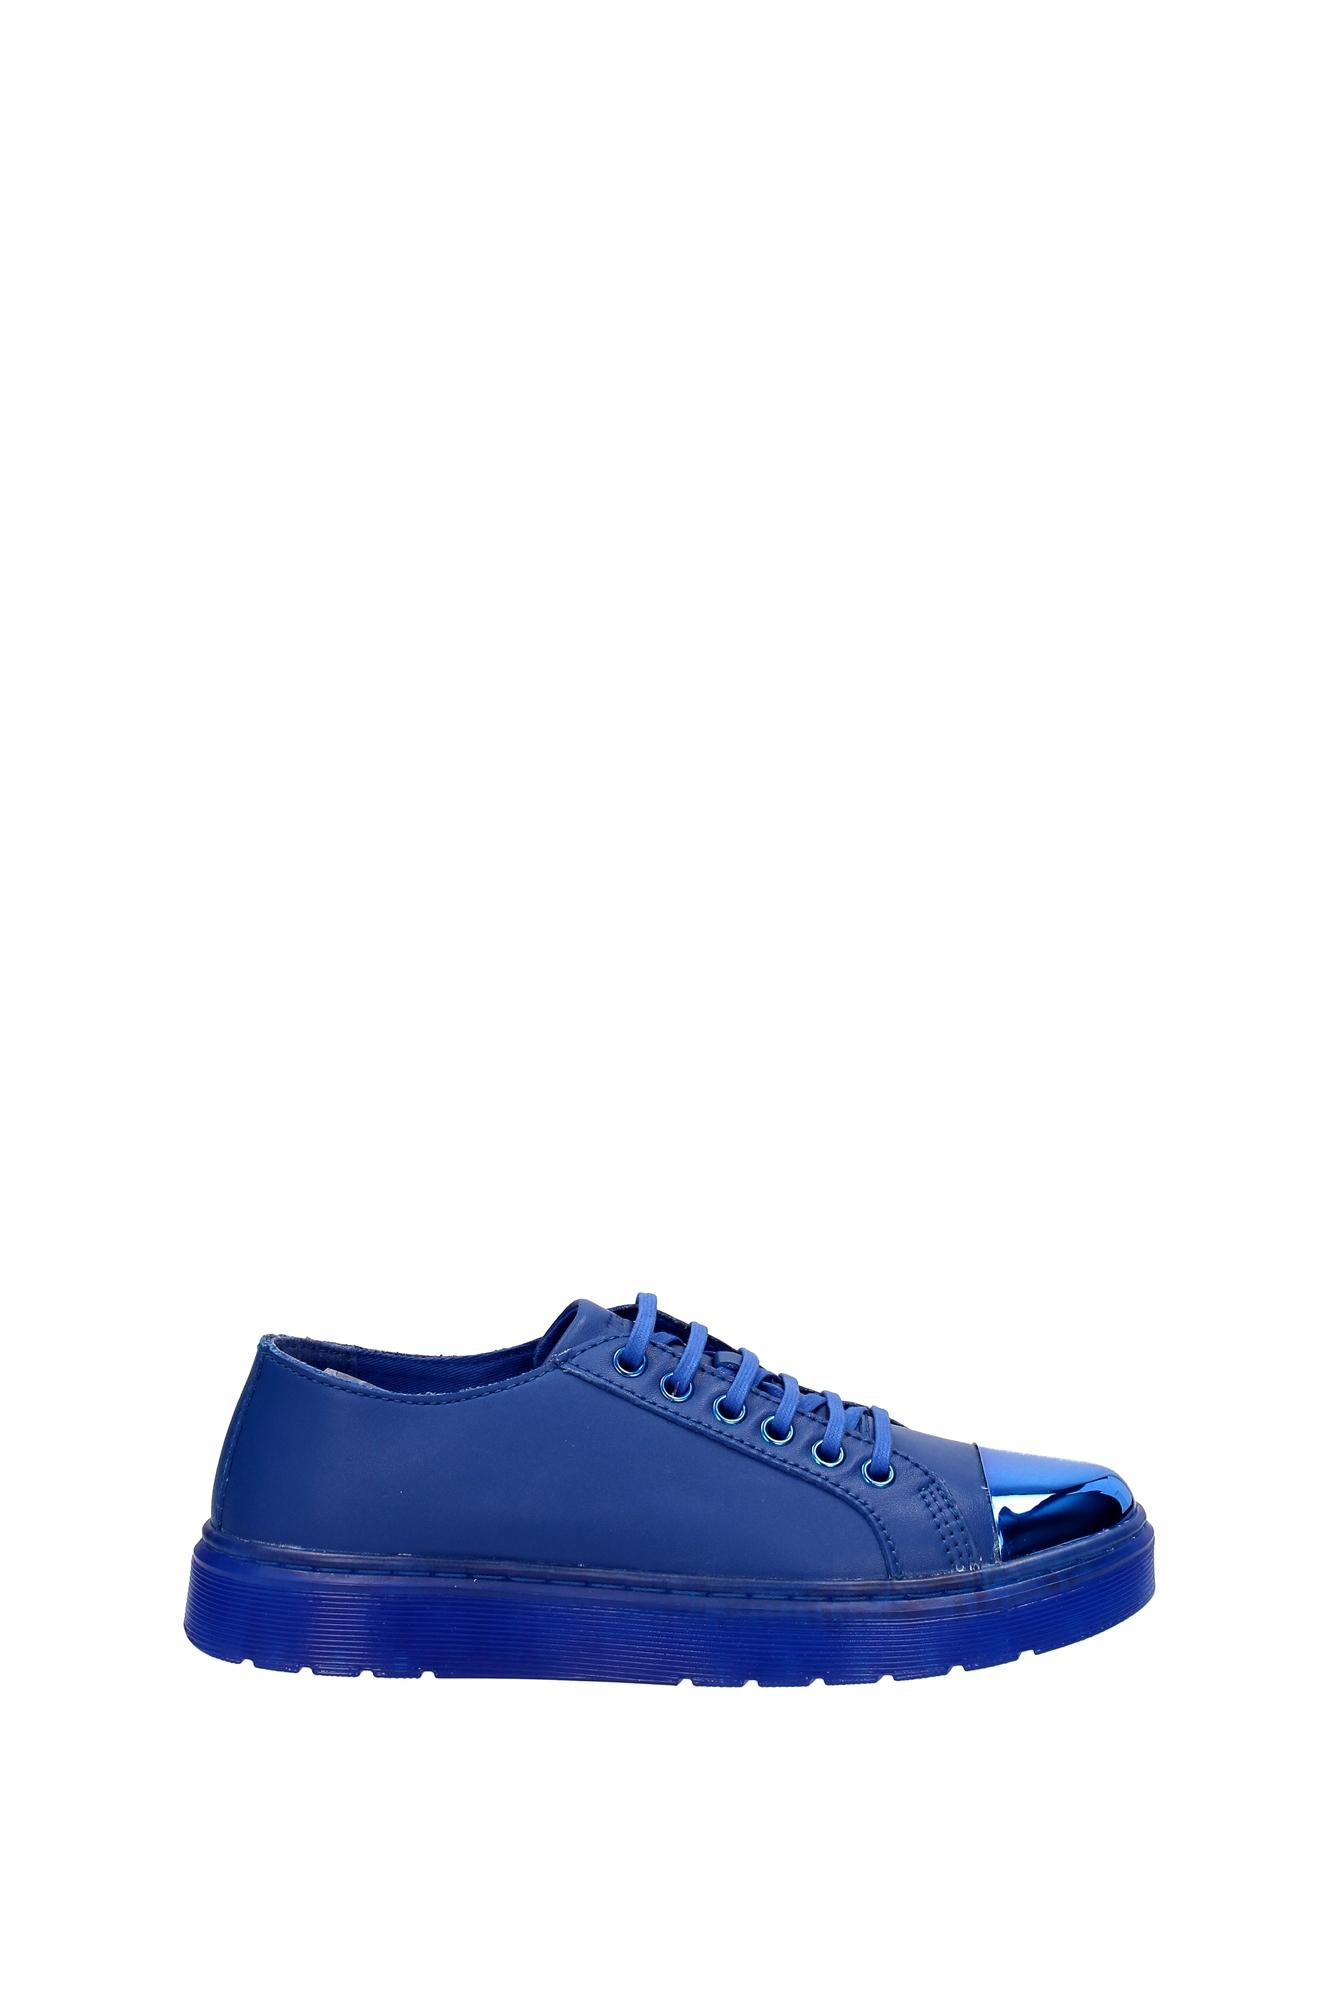 sneakers dr martens damen leder blau alexei16571400blue. Black Bedroom Furniture Sets. Home Design Ideas